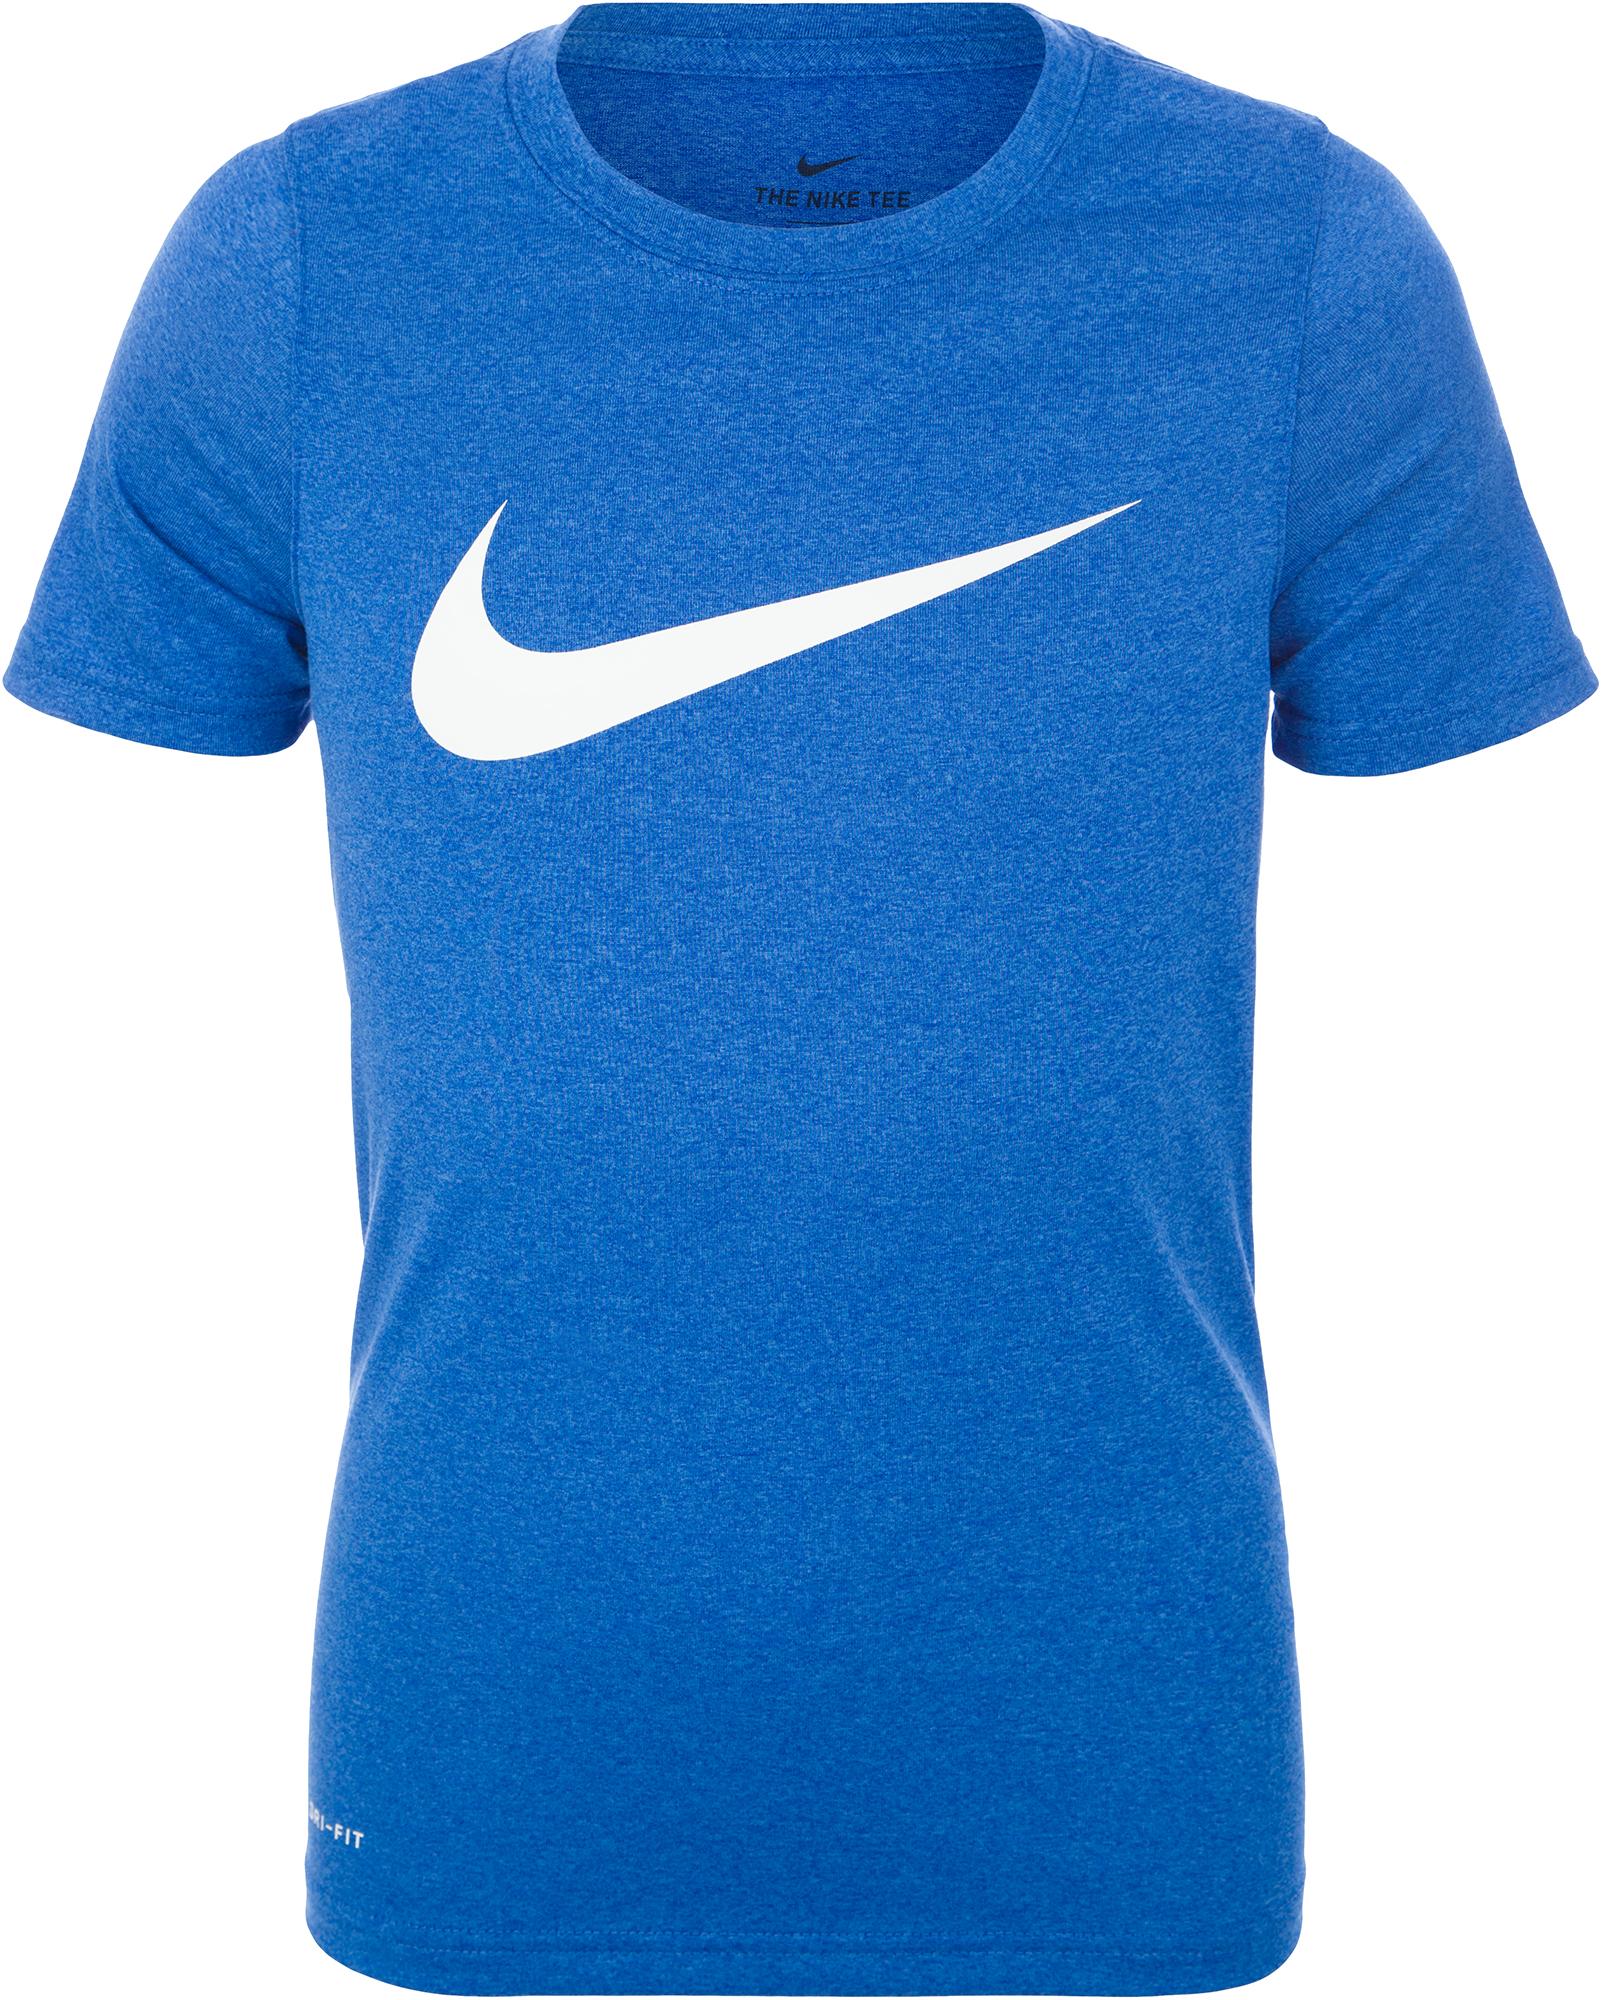 Nike Футболка для мальчиков  Dri-FIT, размер 158-170